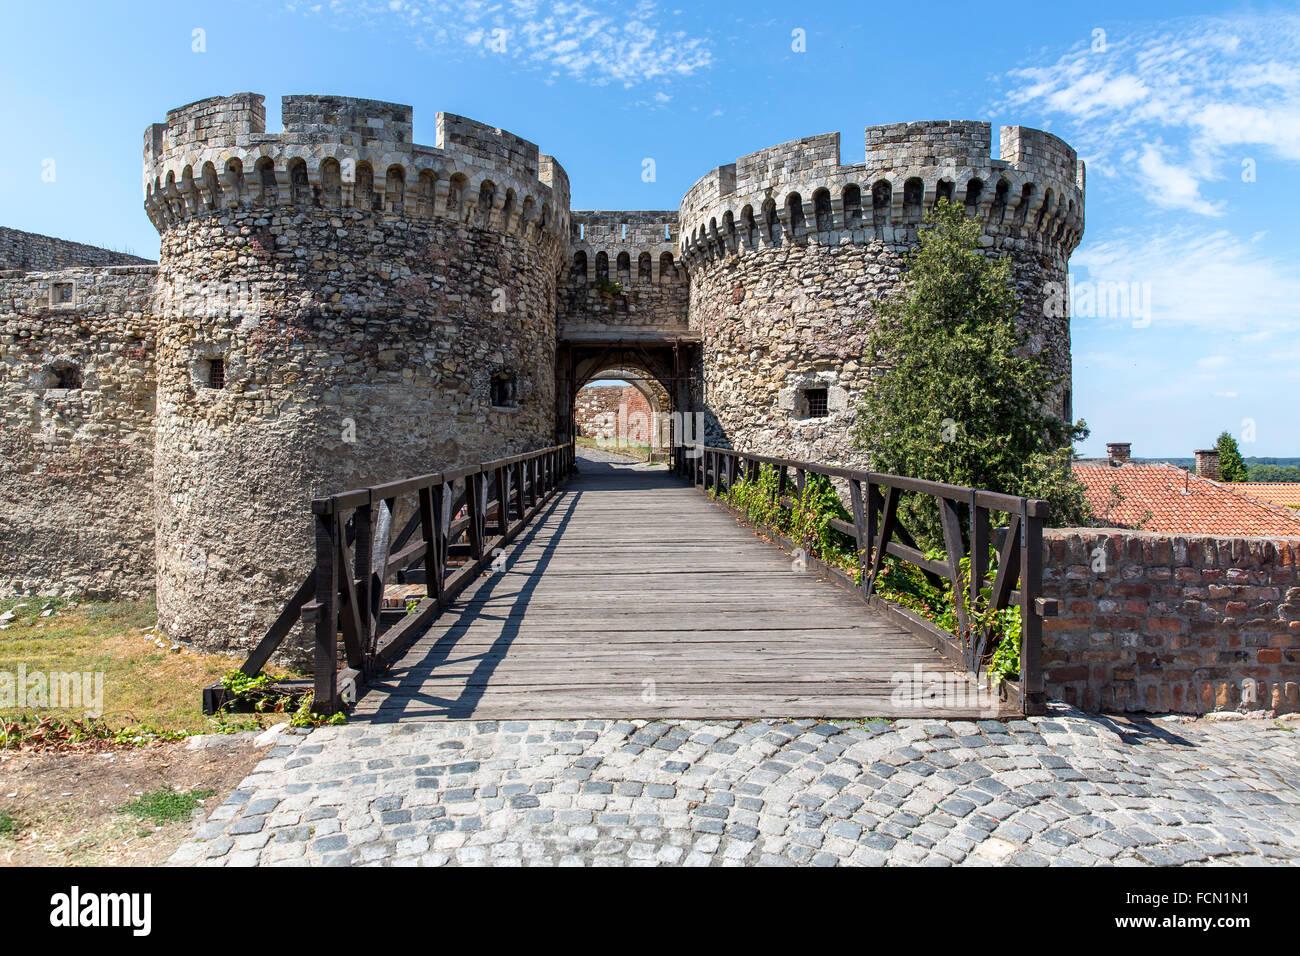 Kalemegdan fortress gate in Belgrade - Stock Image